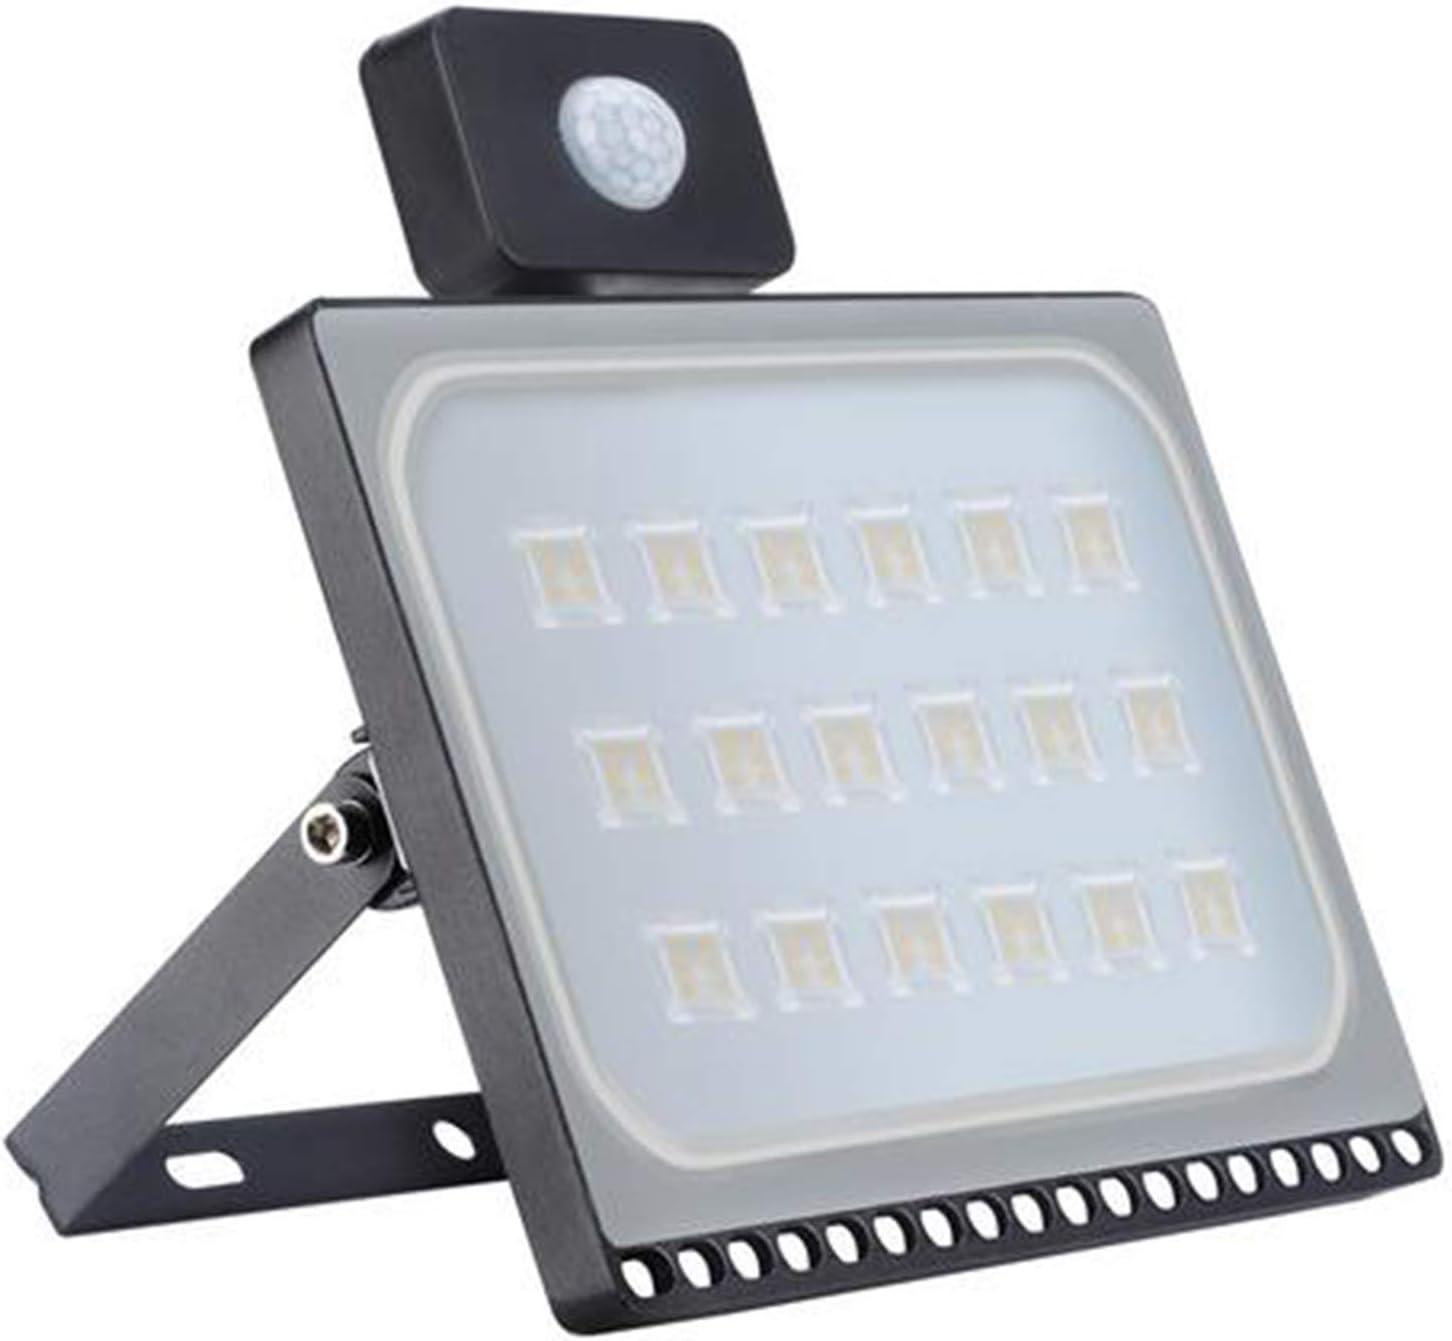 100W Motion Sensor Flood 激安通販販売 オンライン限定商品 Light LED Catinbow Ultra Thin Security